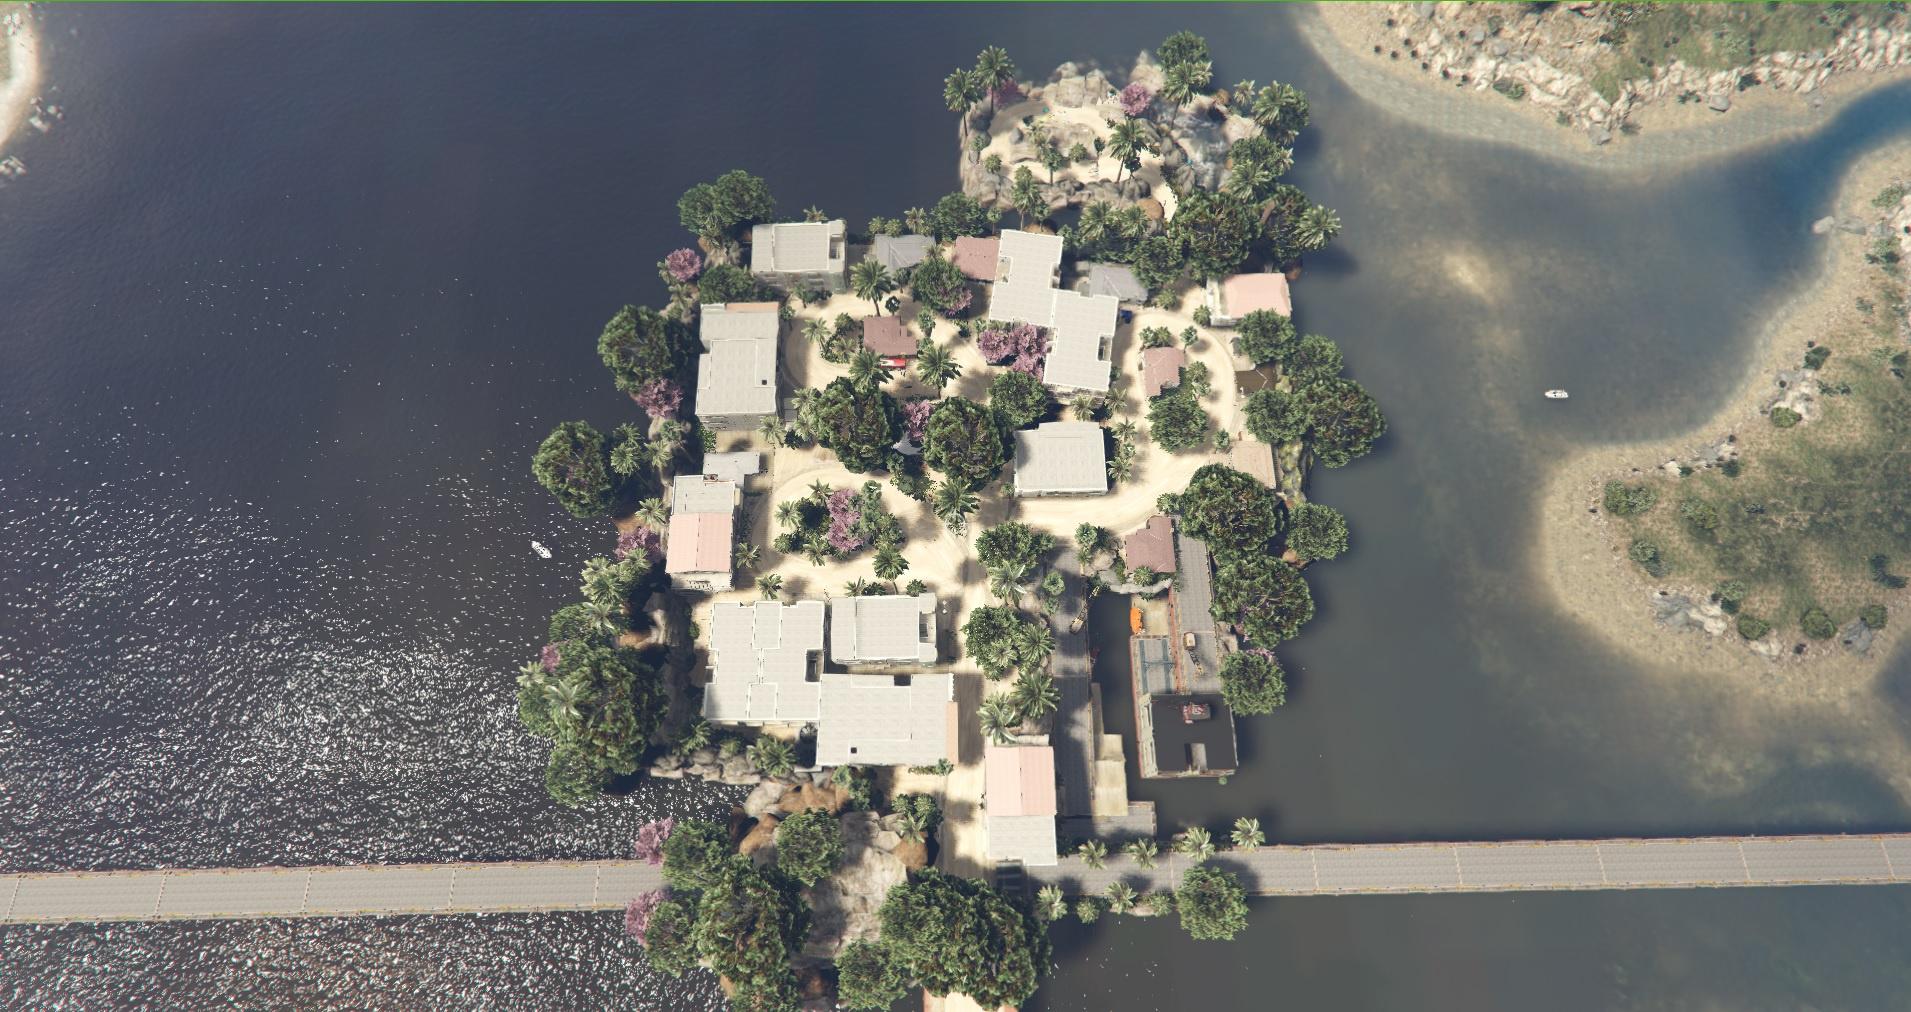 test new island new town gta5. Black Bedroom Furniture Sets. Home Design Ideas